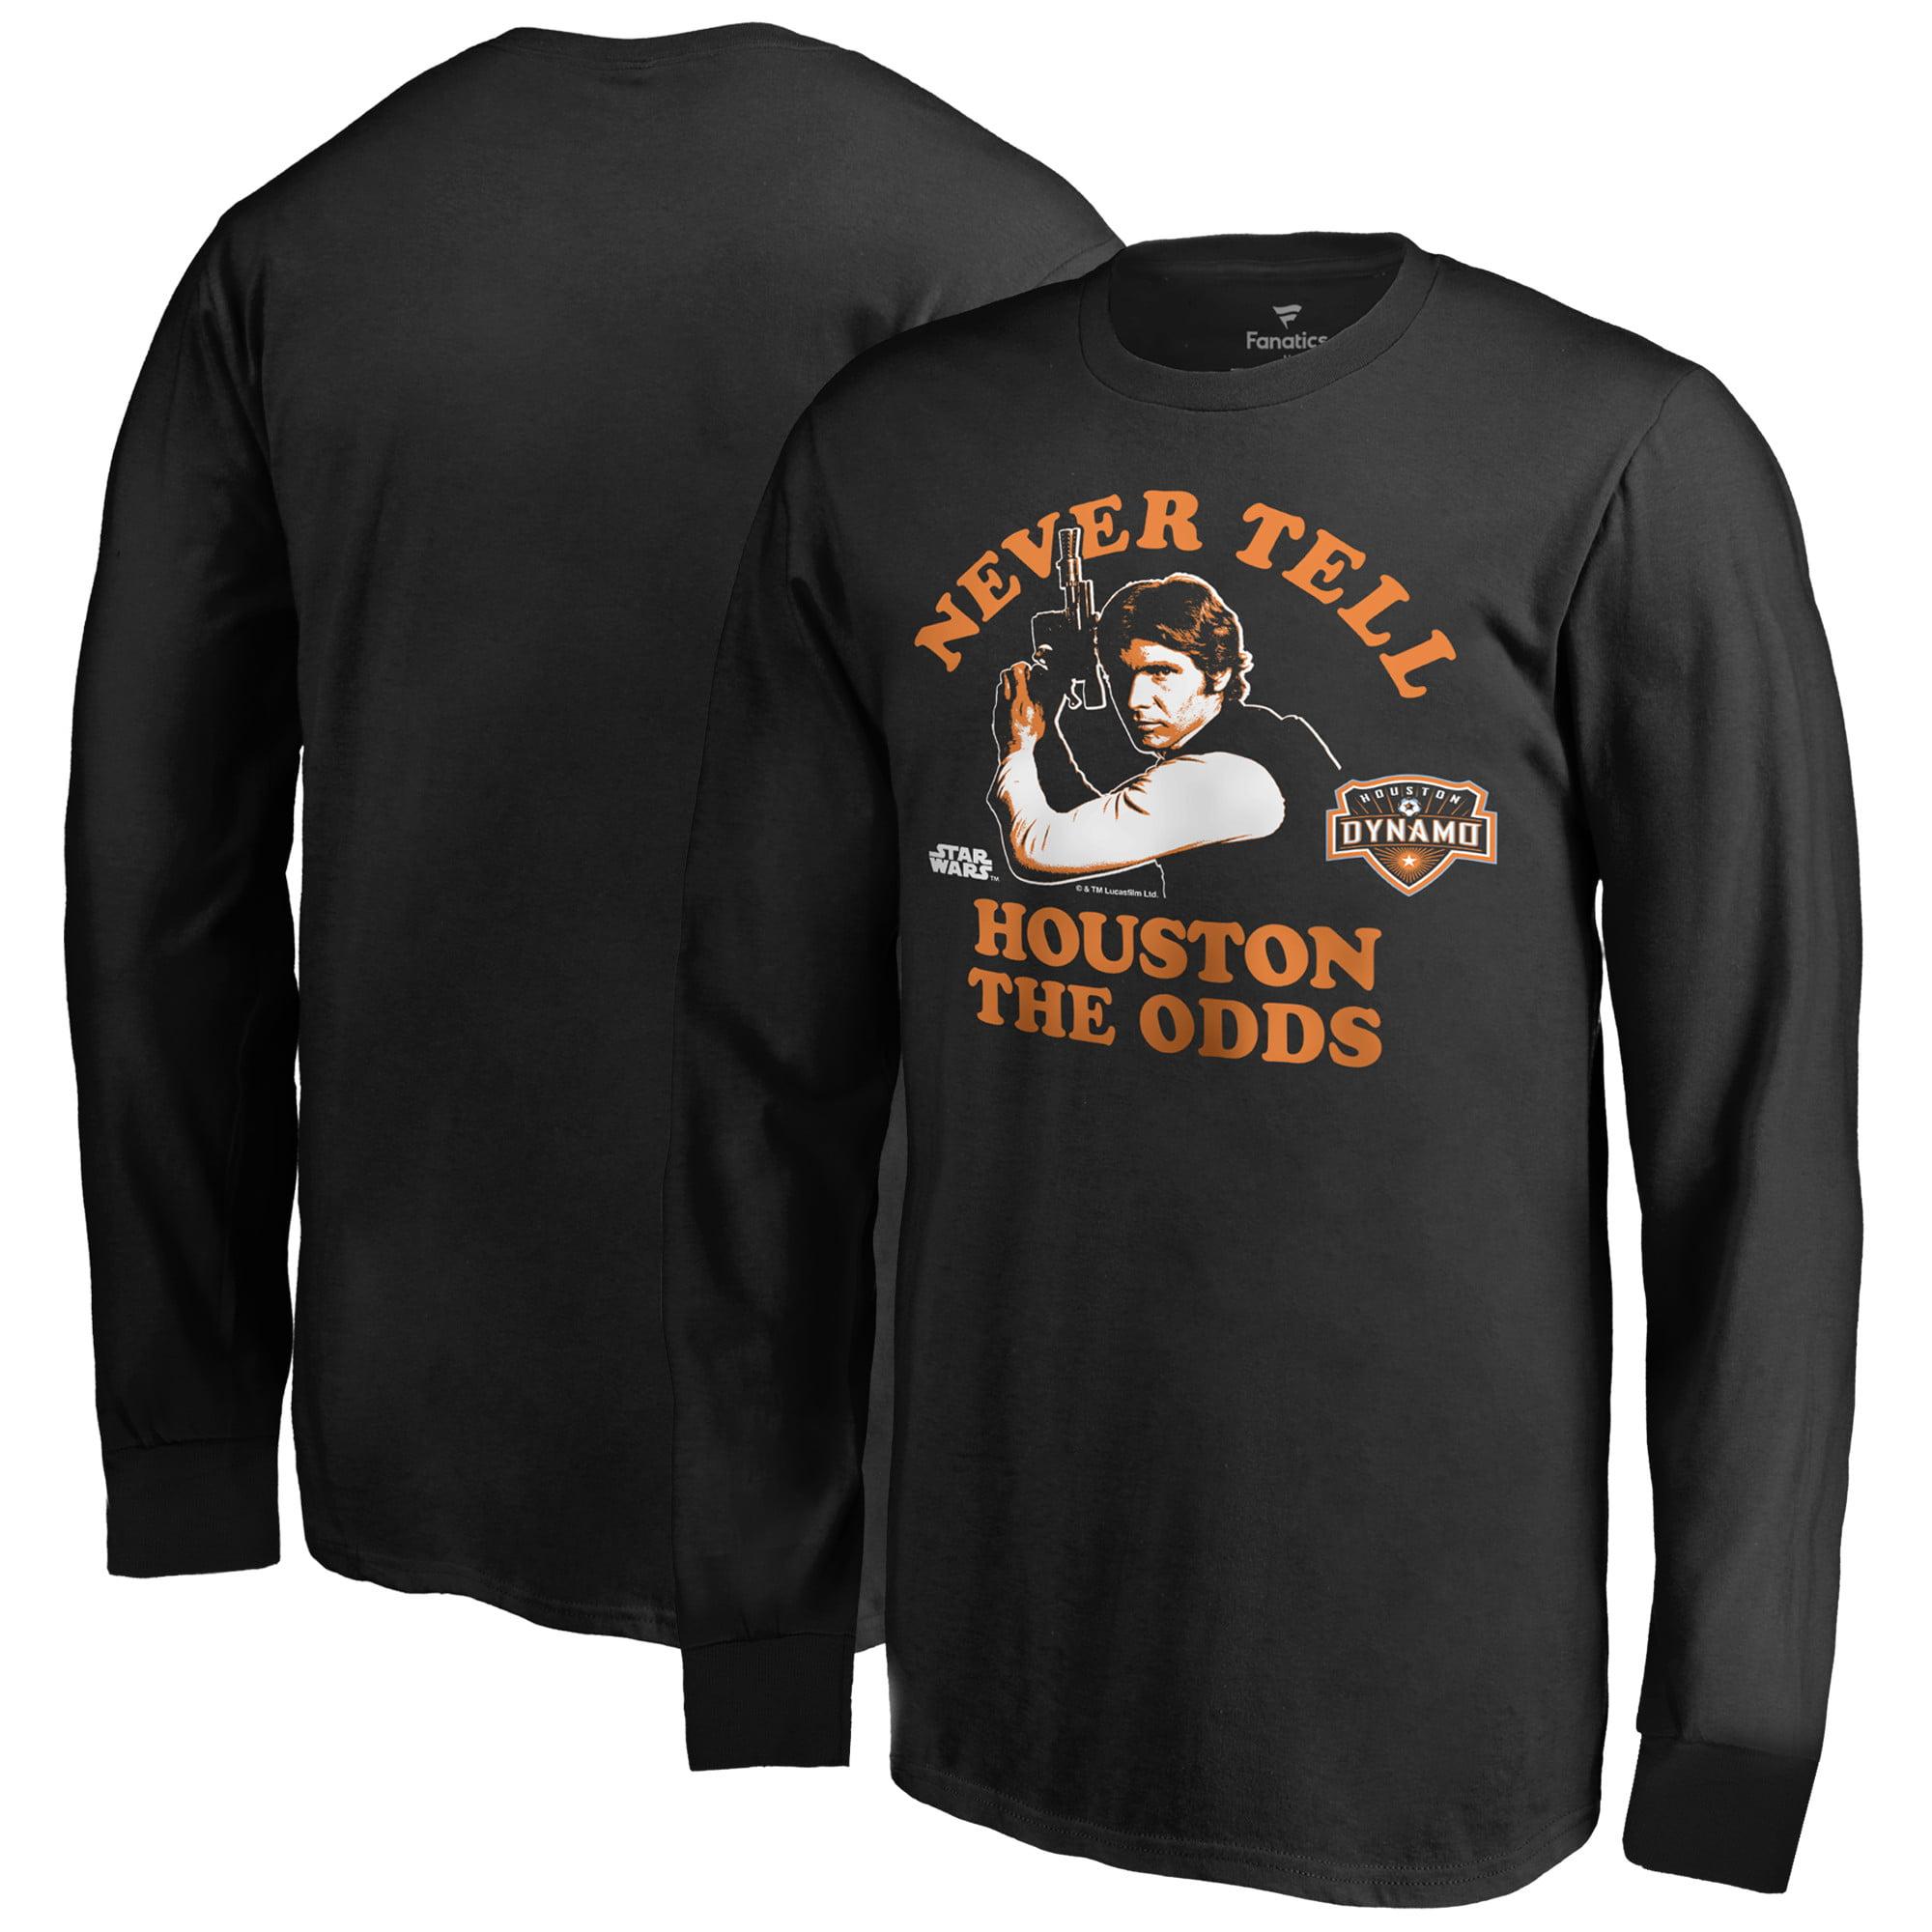 Houston Dynamo Fanatics Branded Youth Star Wars Never Tell the Odds Long Sleeve T-Shirt - Black